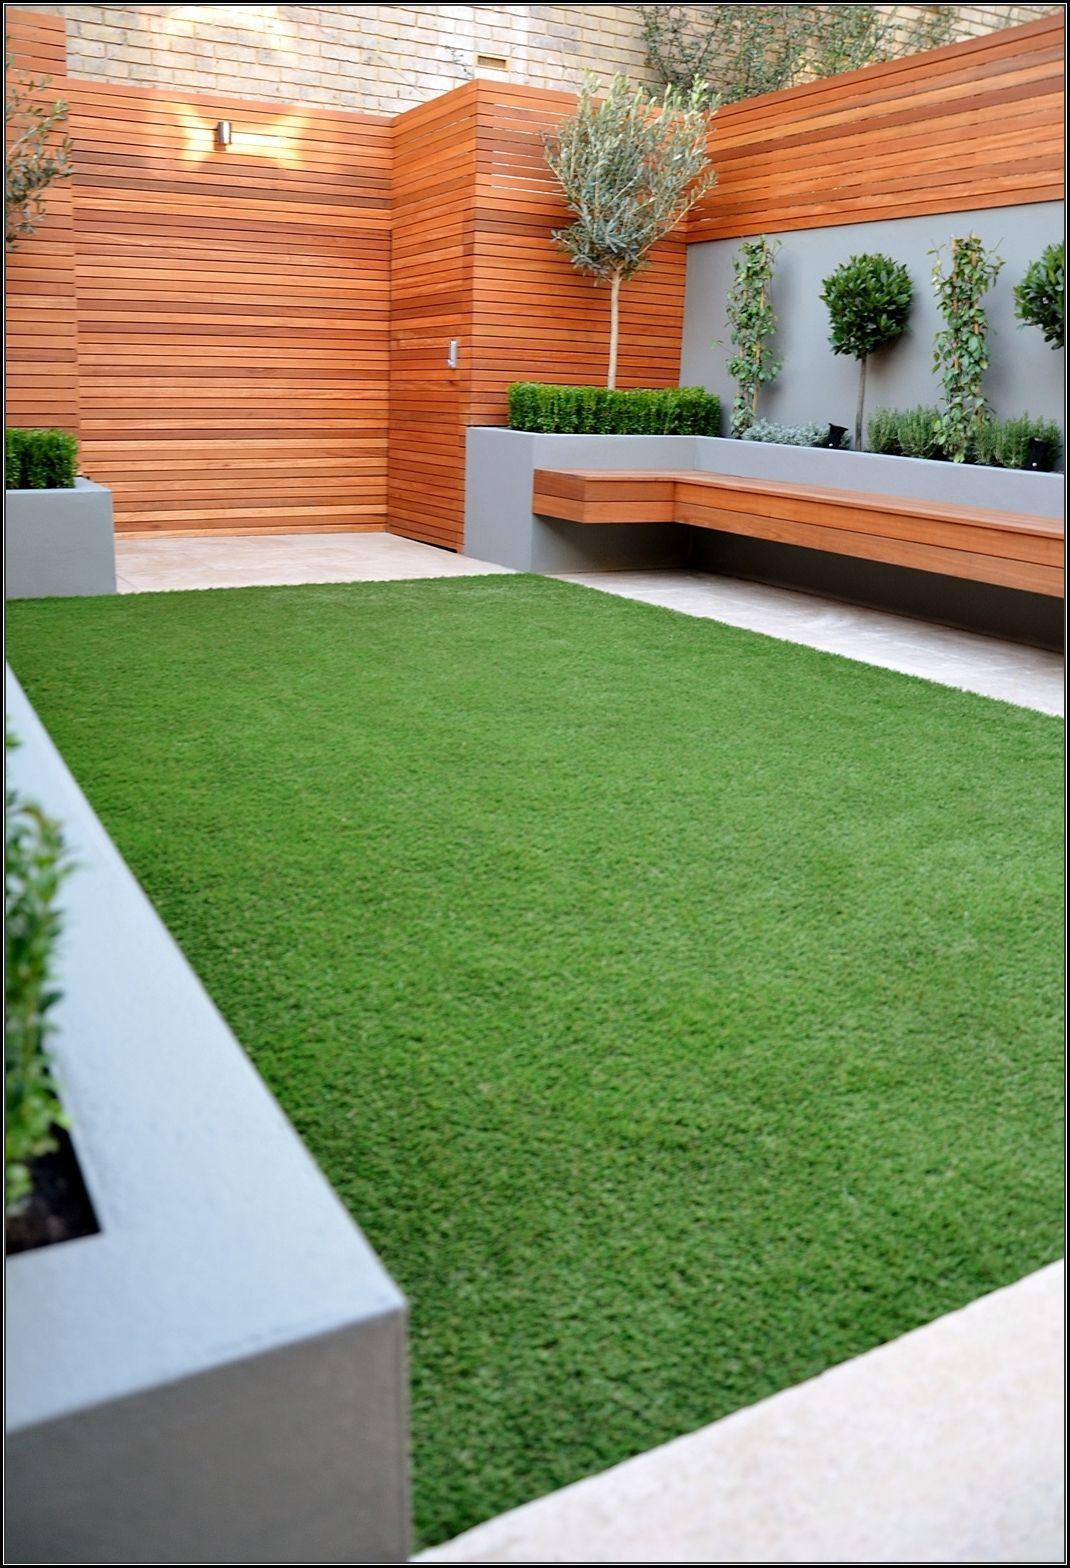 Backyard Landscaping  Landscape Design Style The Best Look for Your Yard Backyard Landscaping  Landscape Design Style The Best Look for Your Yard